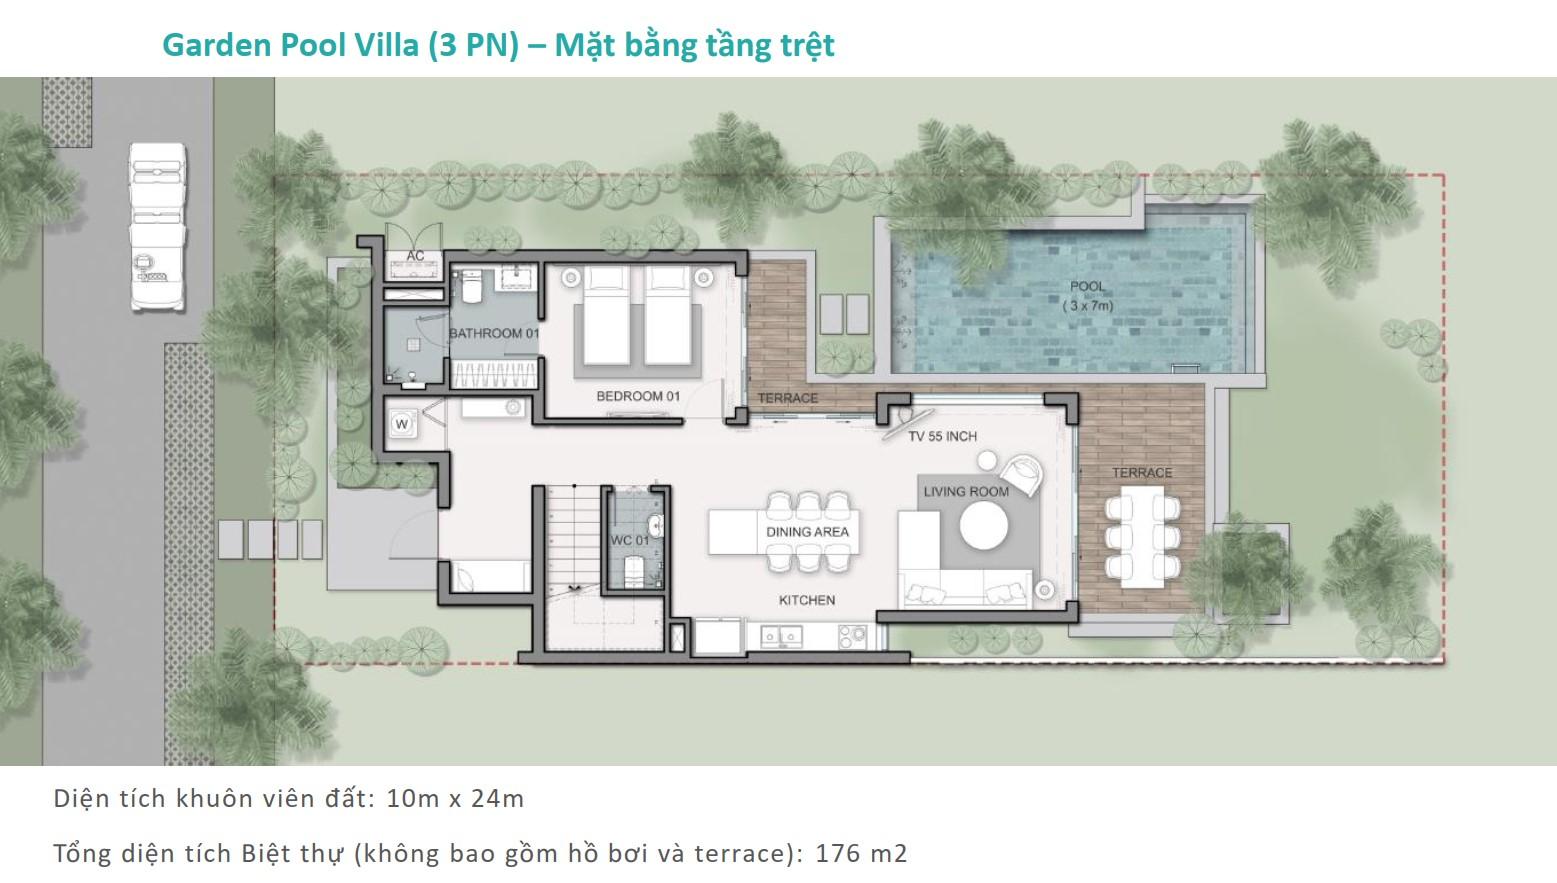 mat-bang-3pn-pool-du-an-maia-resort-quy-nhon